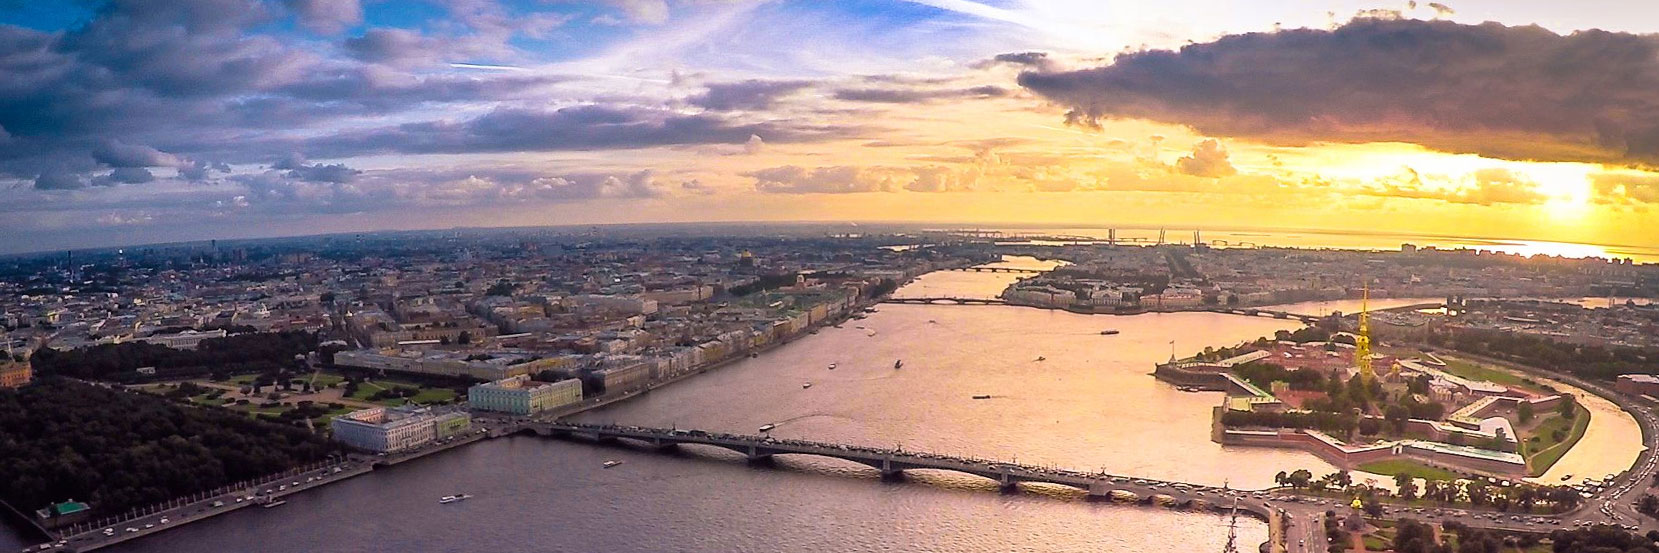 ИИТЕР ОИЛ - Санкт-Петербург